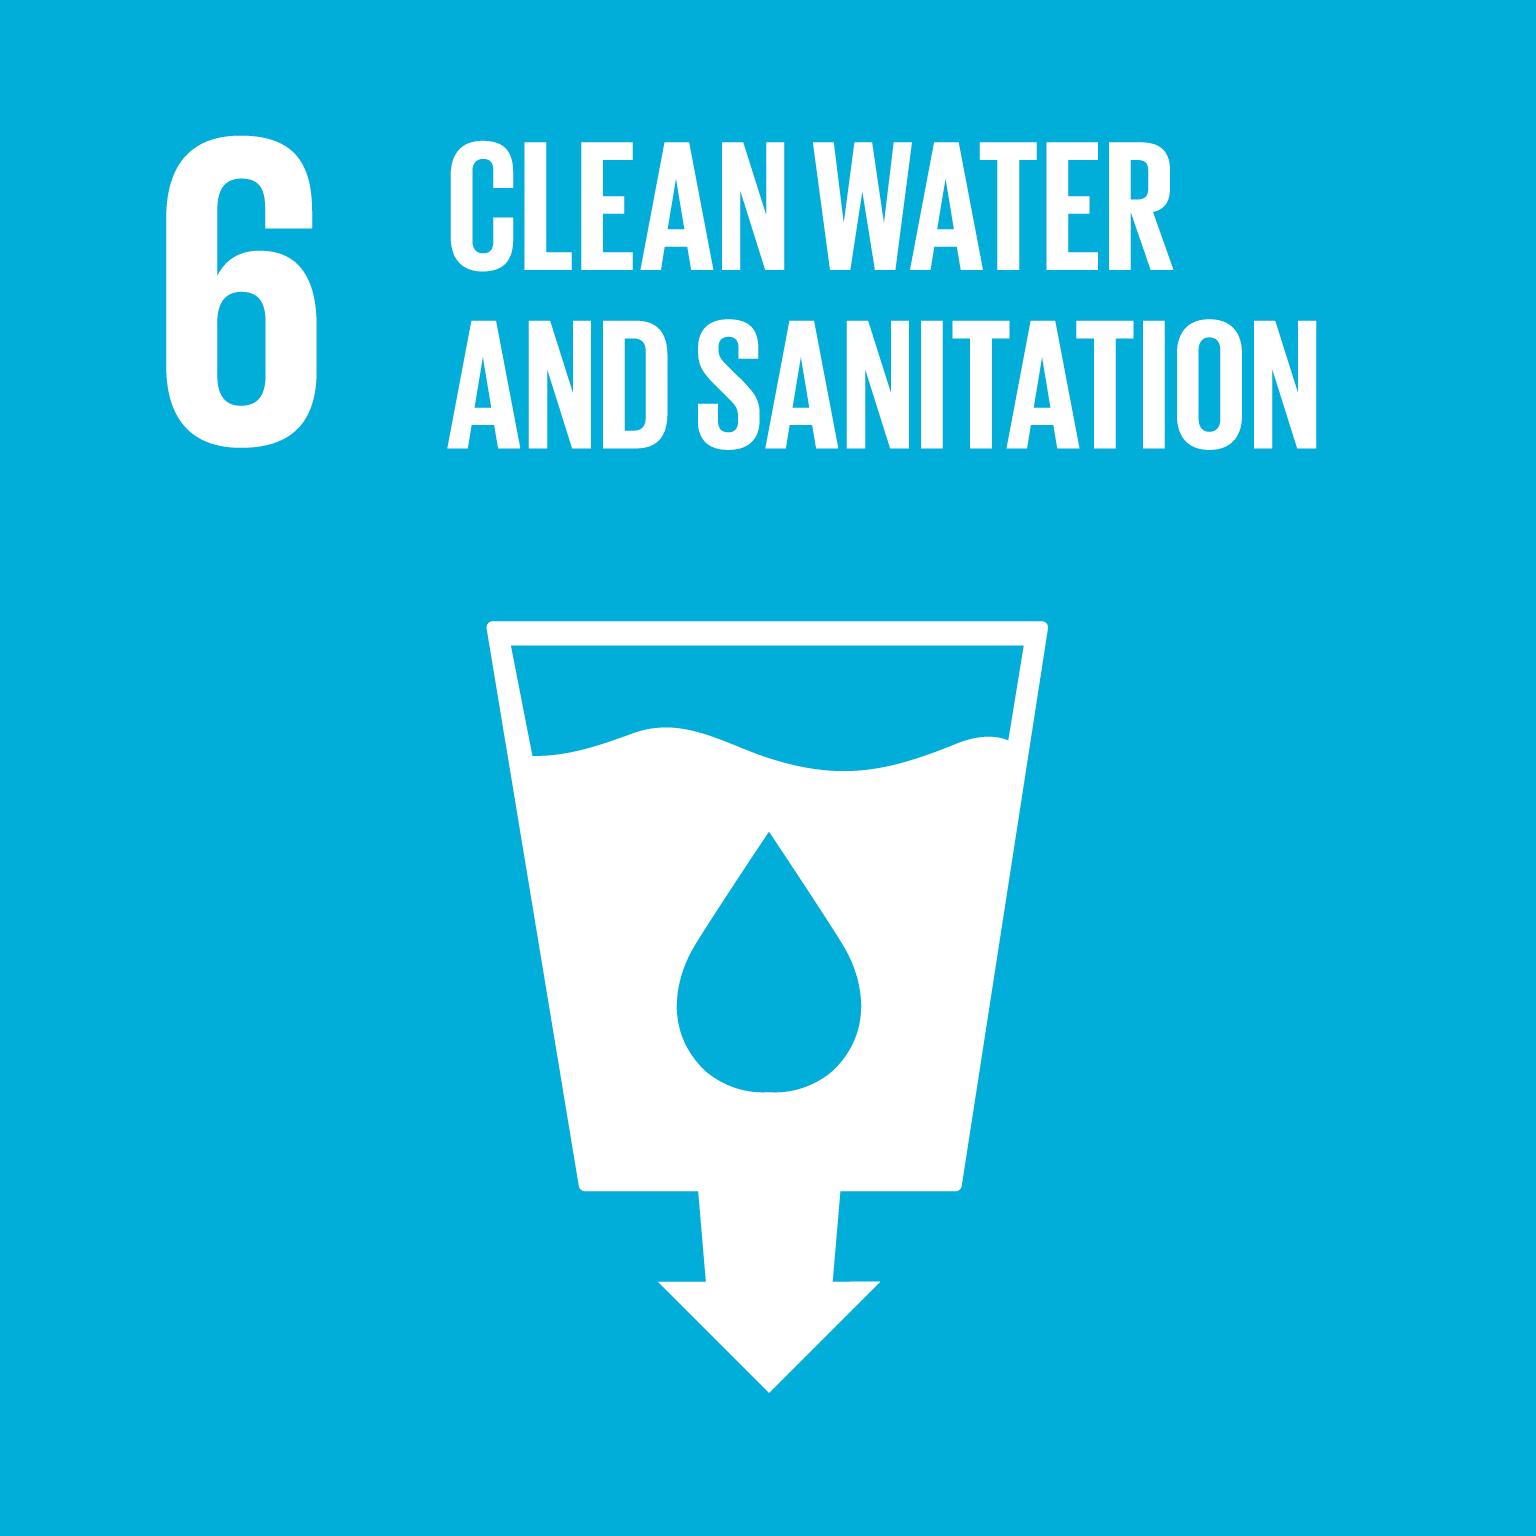 SDG Goal #6 Clean Water